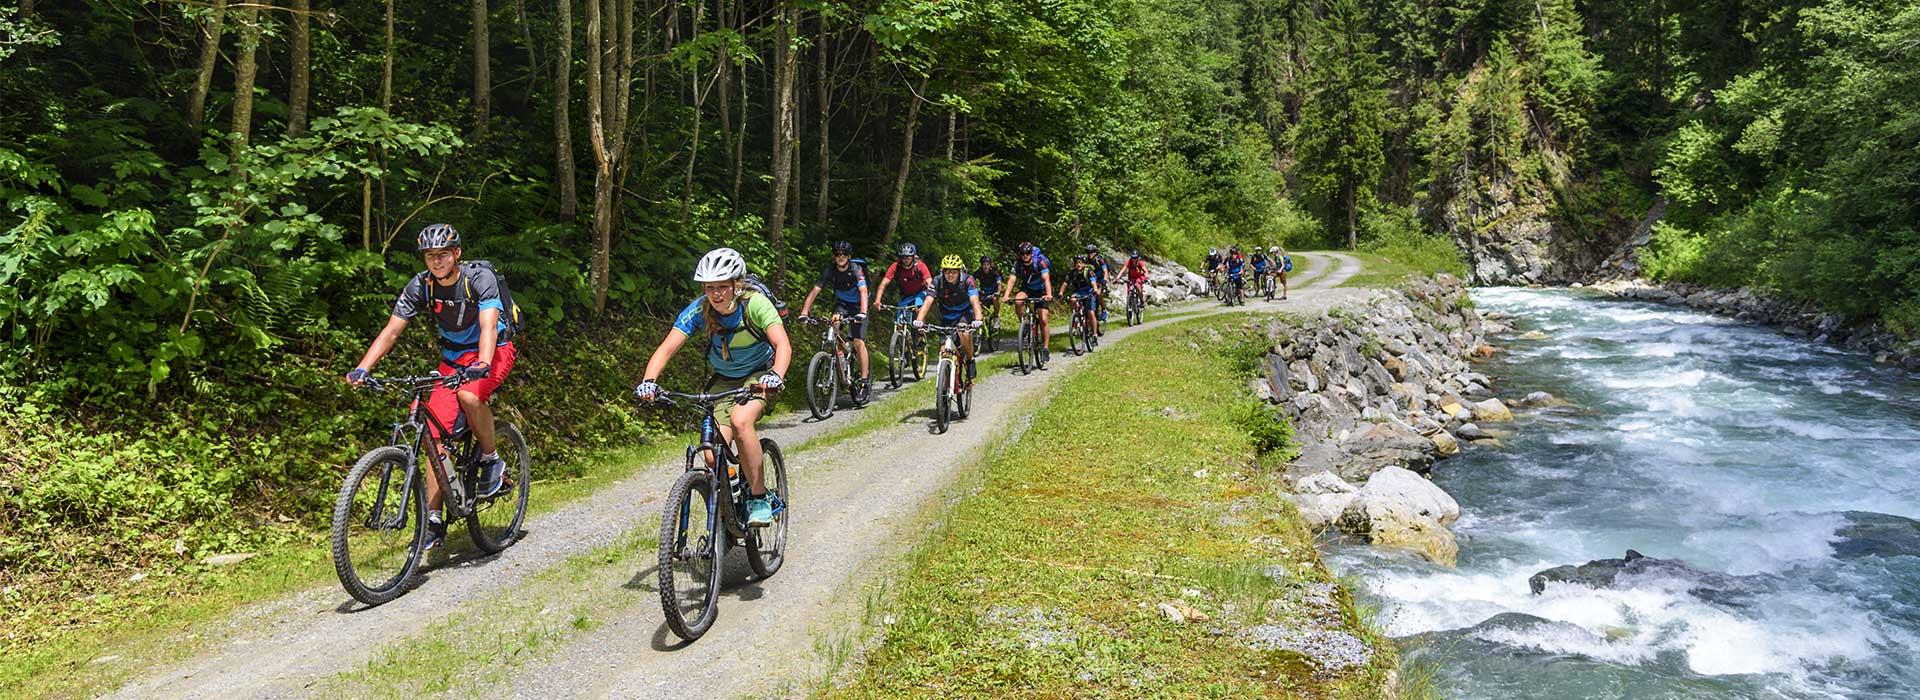 Gruppe Mountainbiker im Wald | Symbolbild | Oberhof Hotel Urlaub im Thüringenschanze